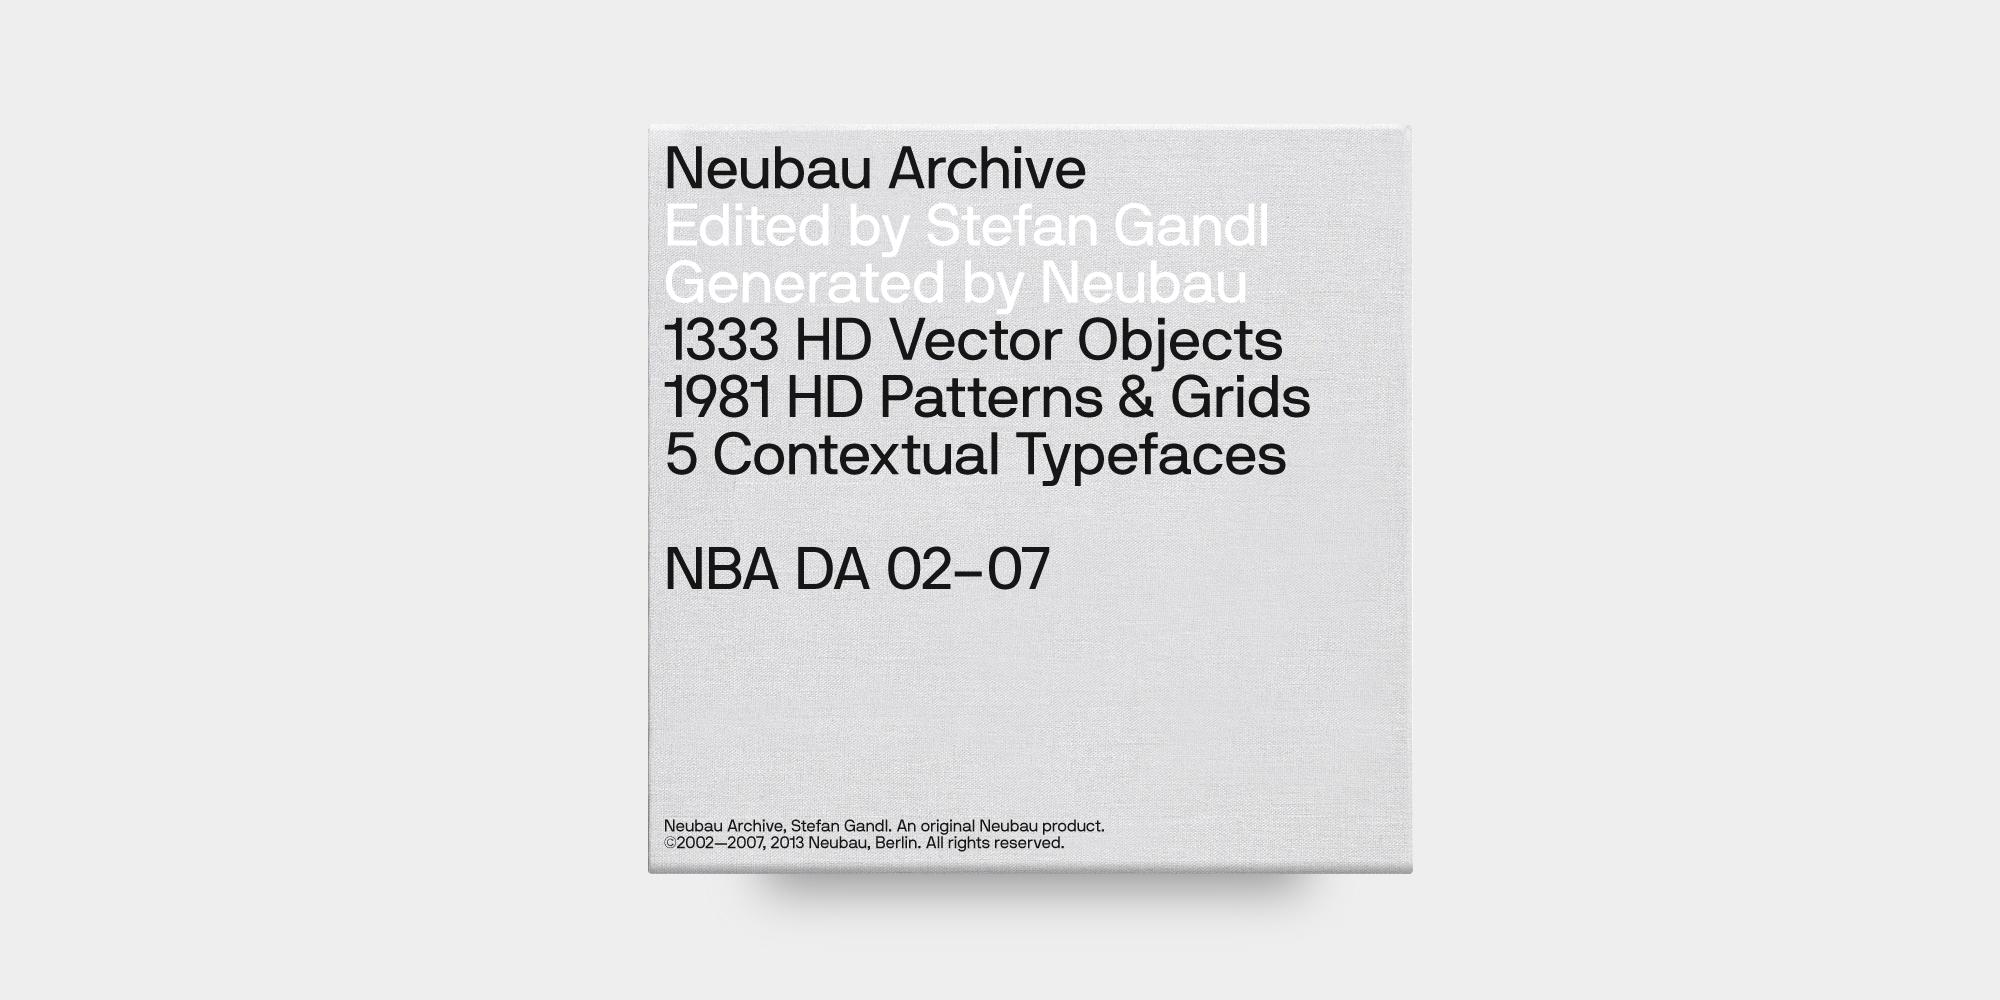 NBL — Neubau Archive